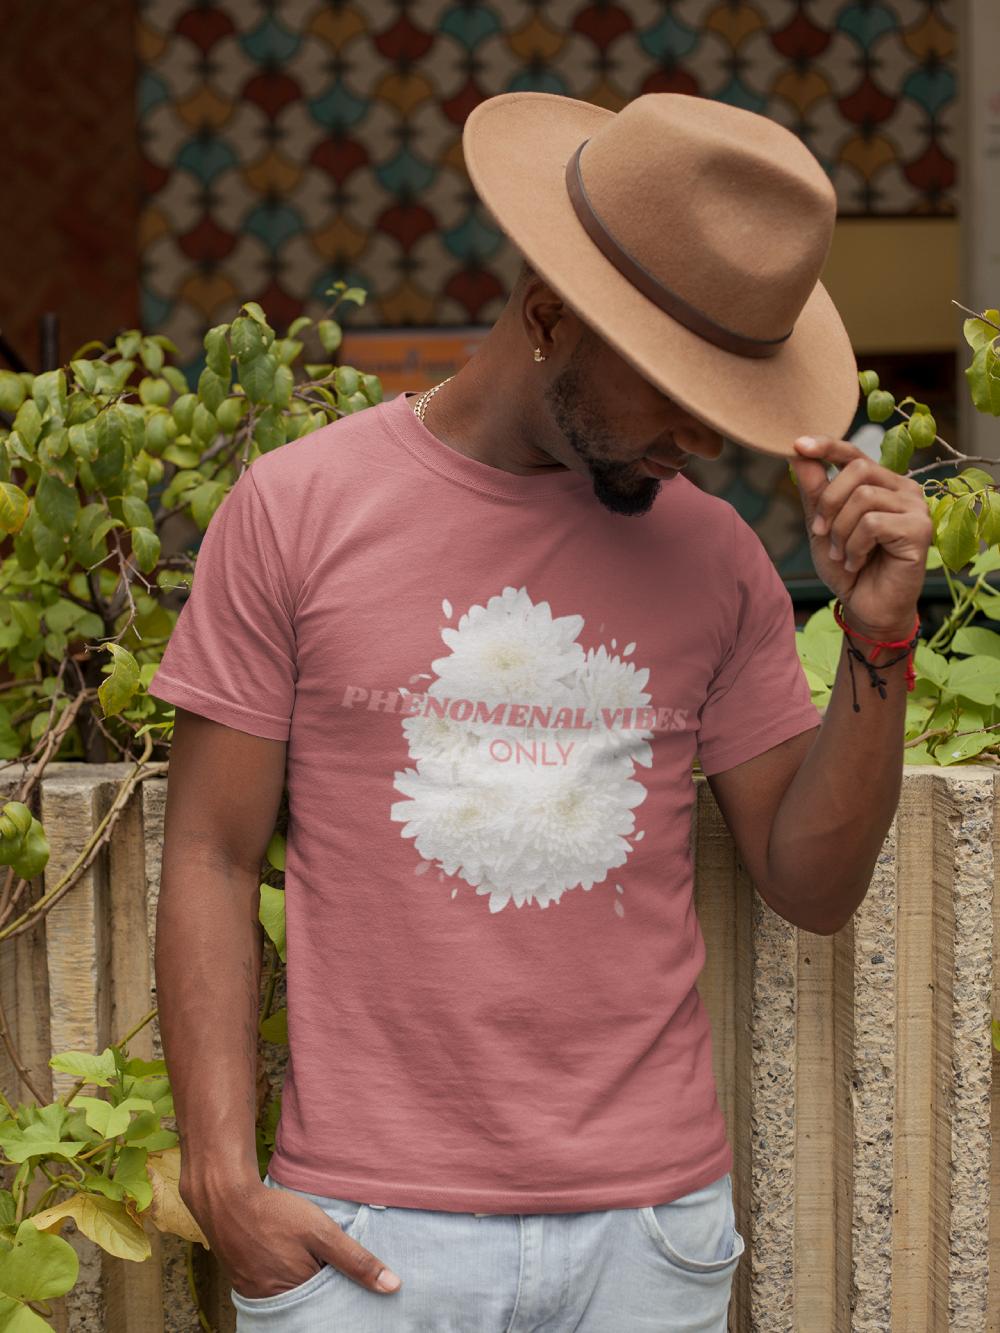 t-shirt-mockup-of-a-man-wearing-a-felt-w